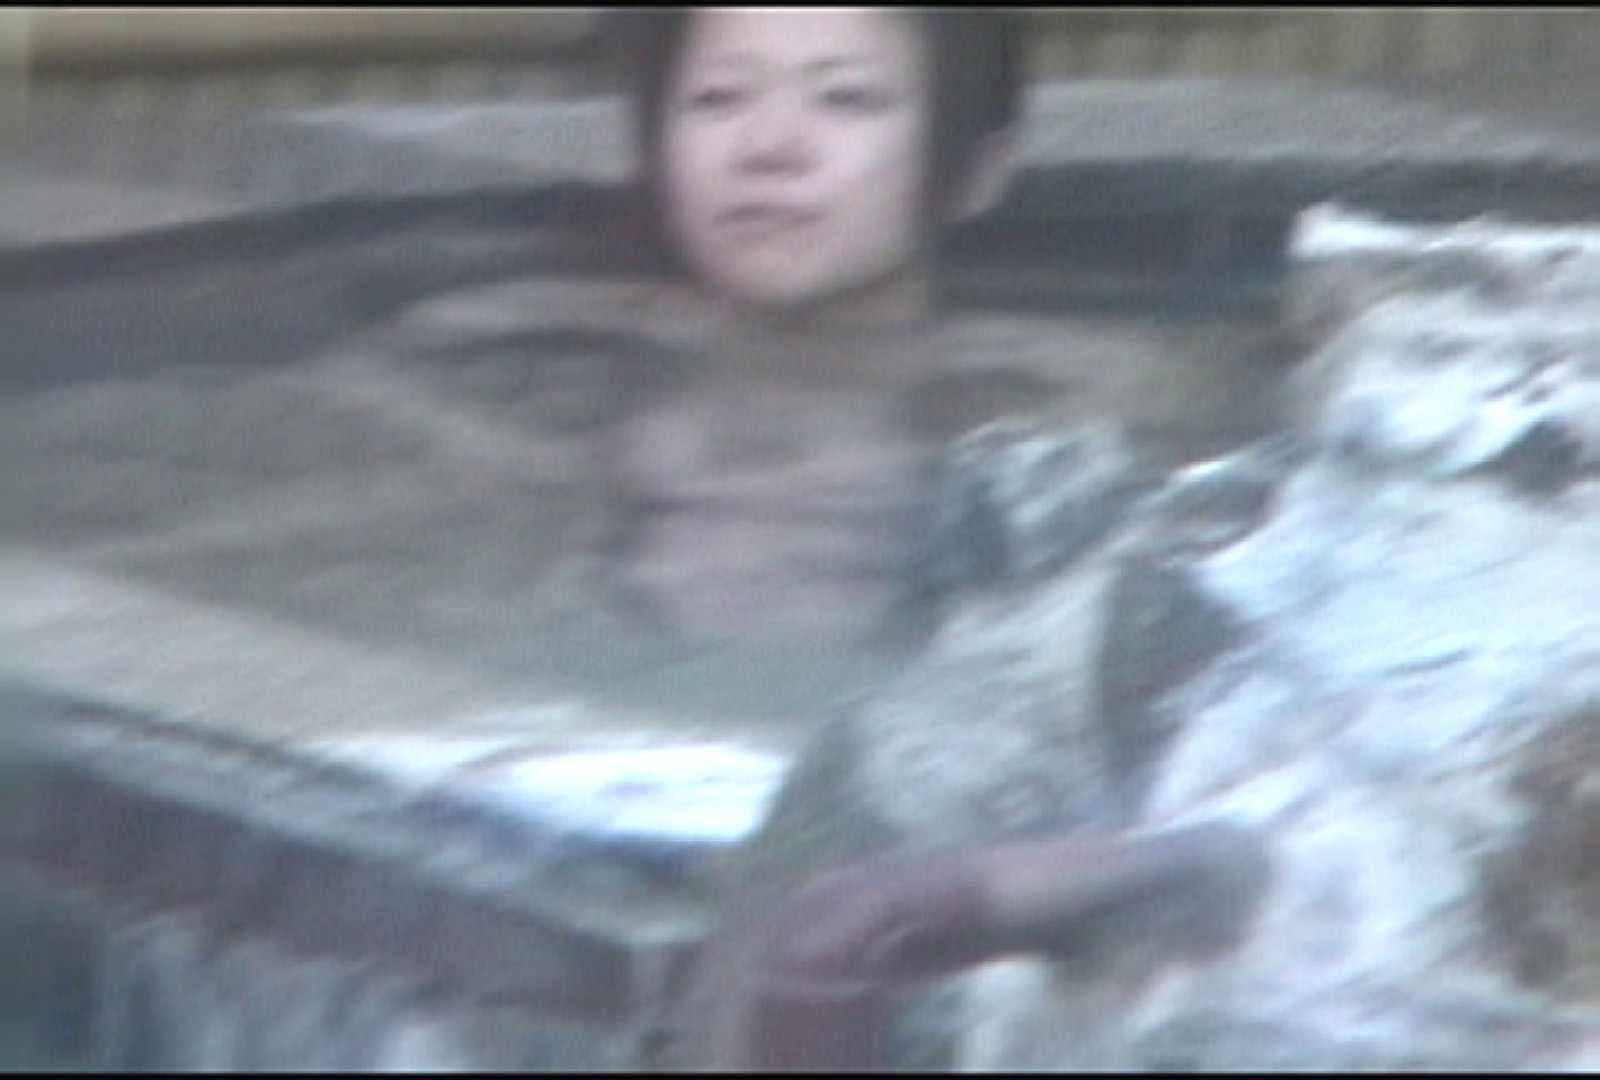 Aquaな露天風呂Vol.175 盗撮シリーズ | 露天風呂編  91PIX 29